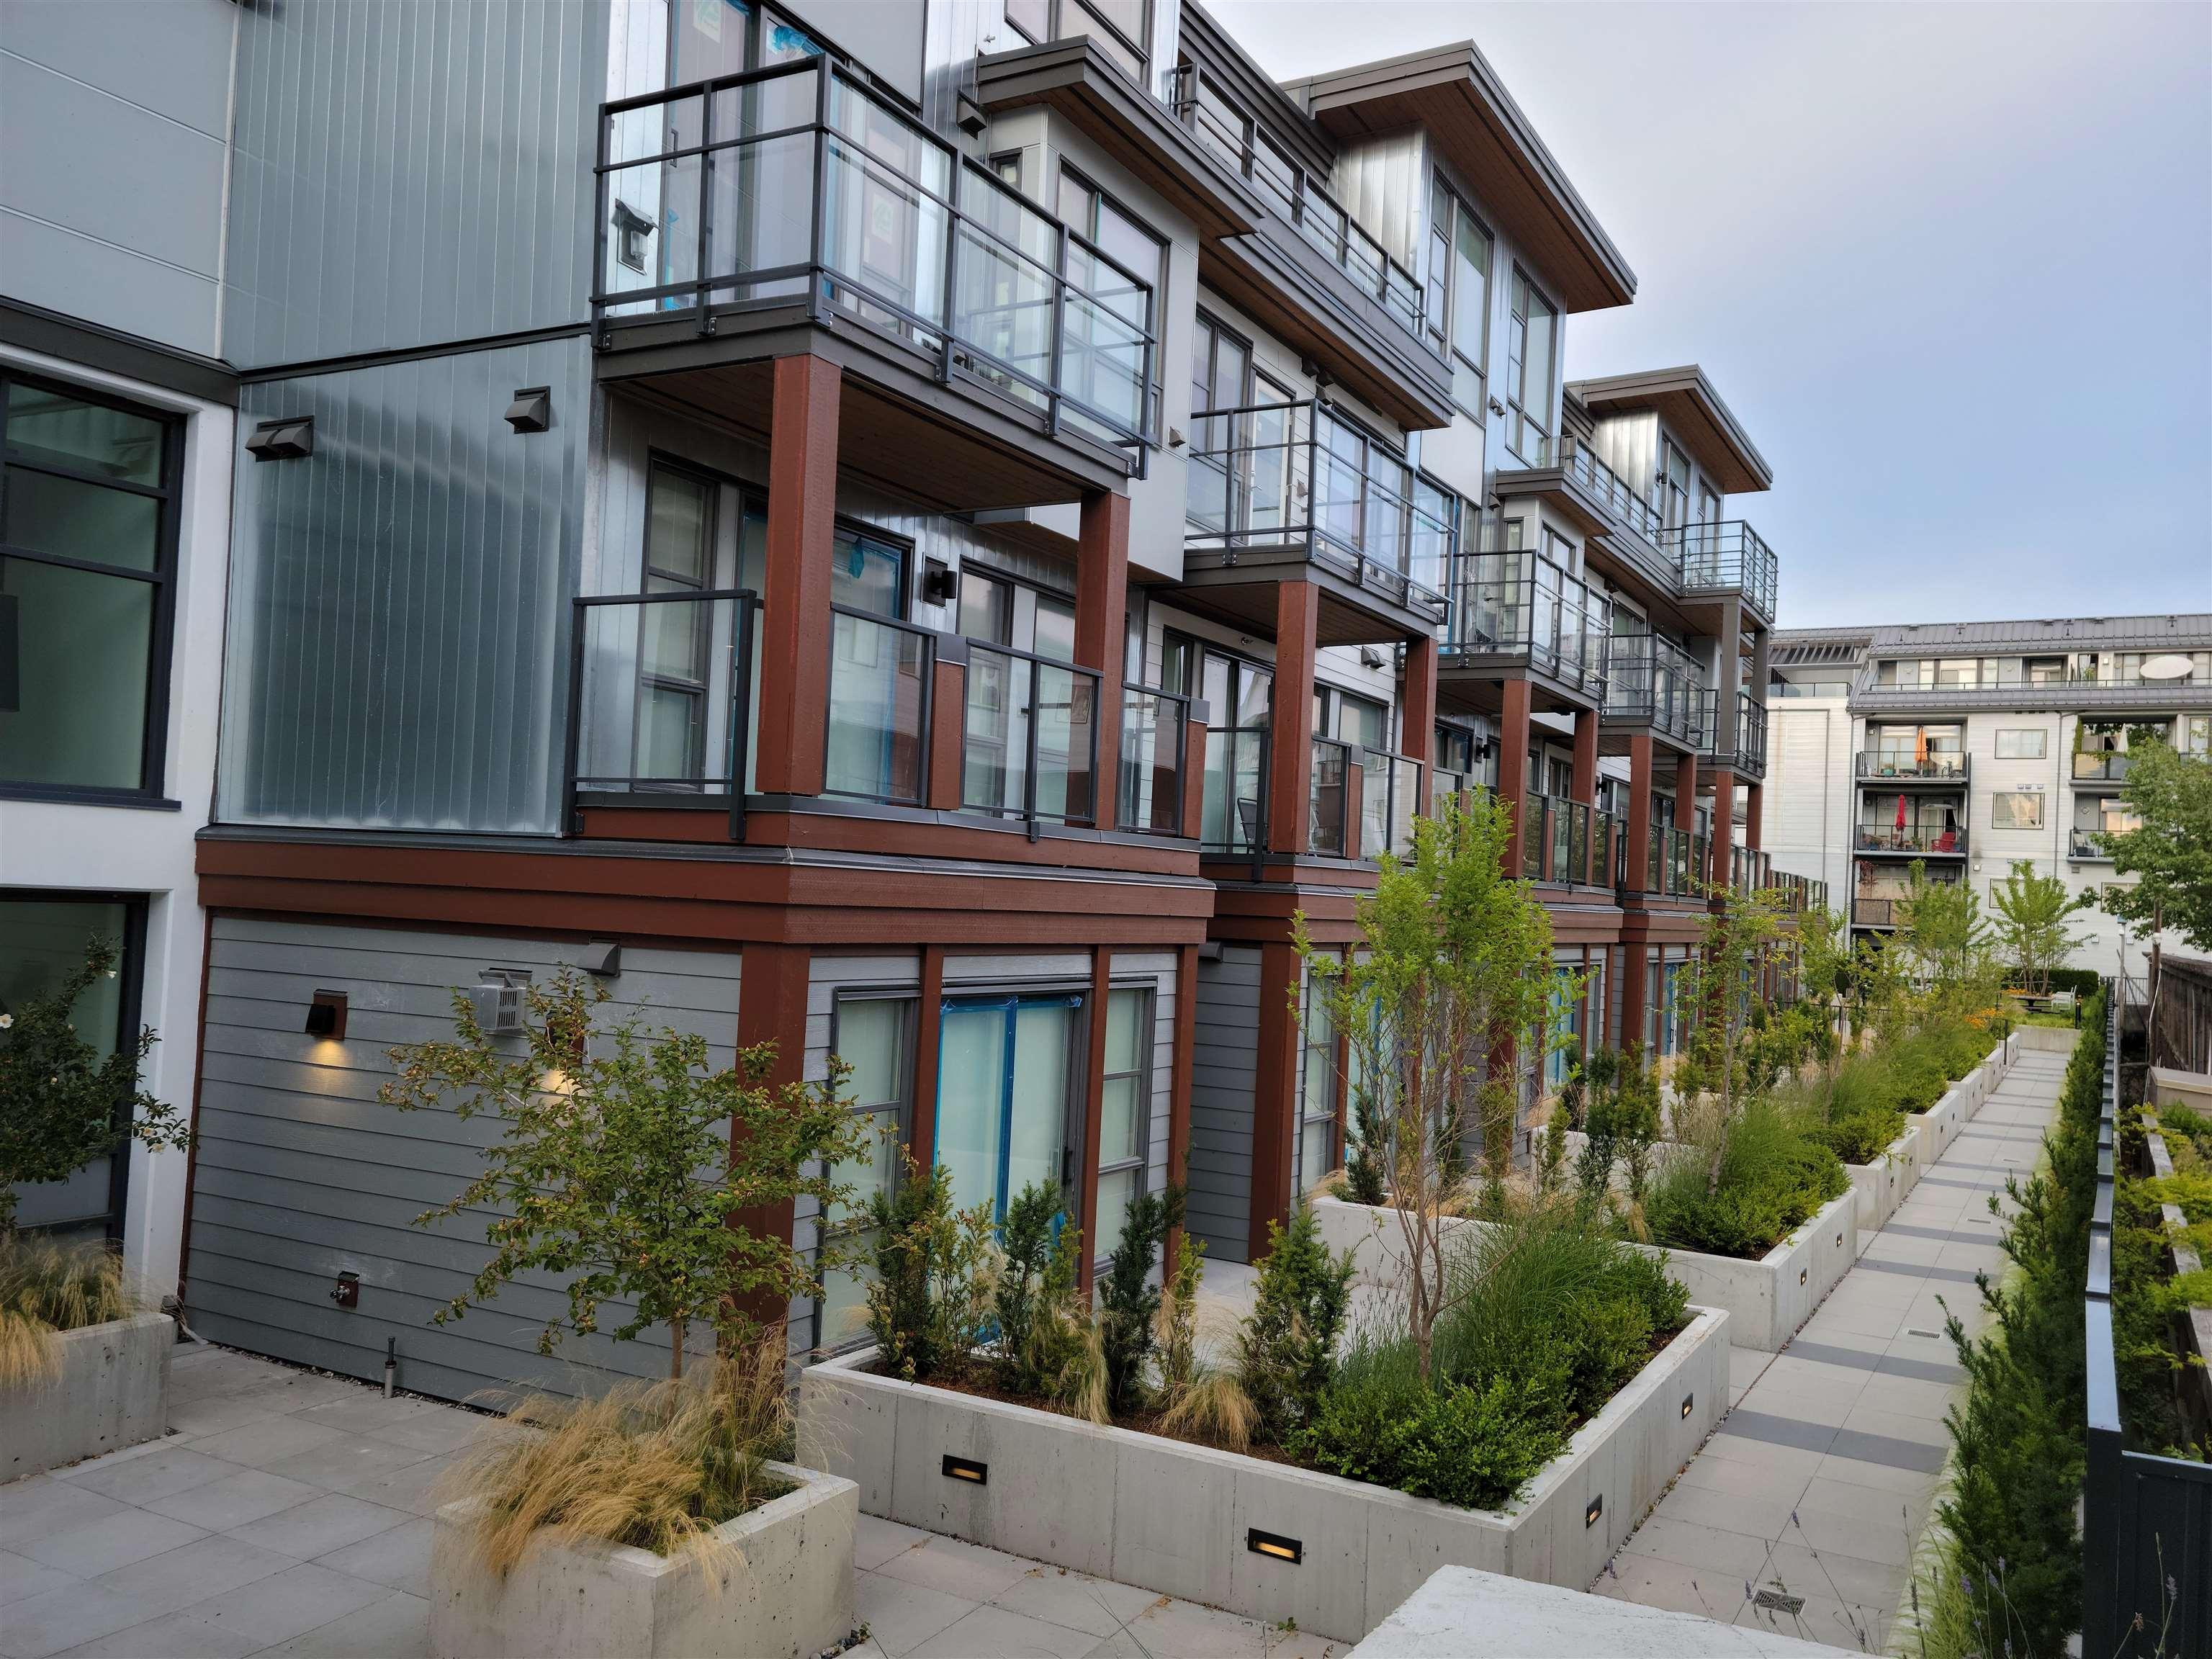 413 13040 NO. 2 ROAD - Steveston South Apartment/Condo for sale, 2 Bedrooms (R2609794)